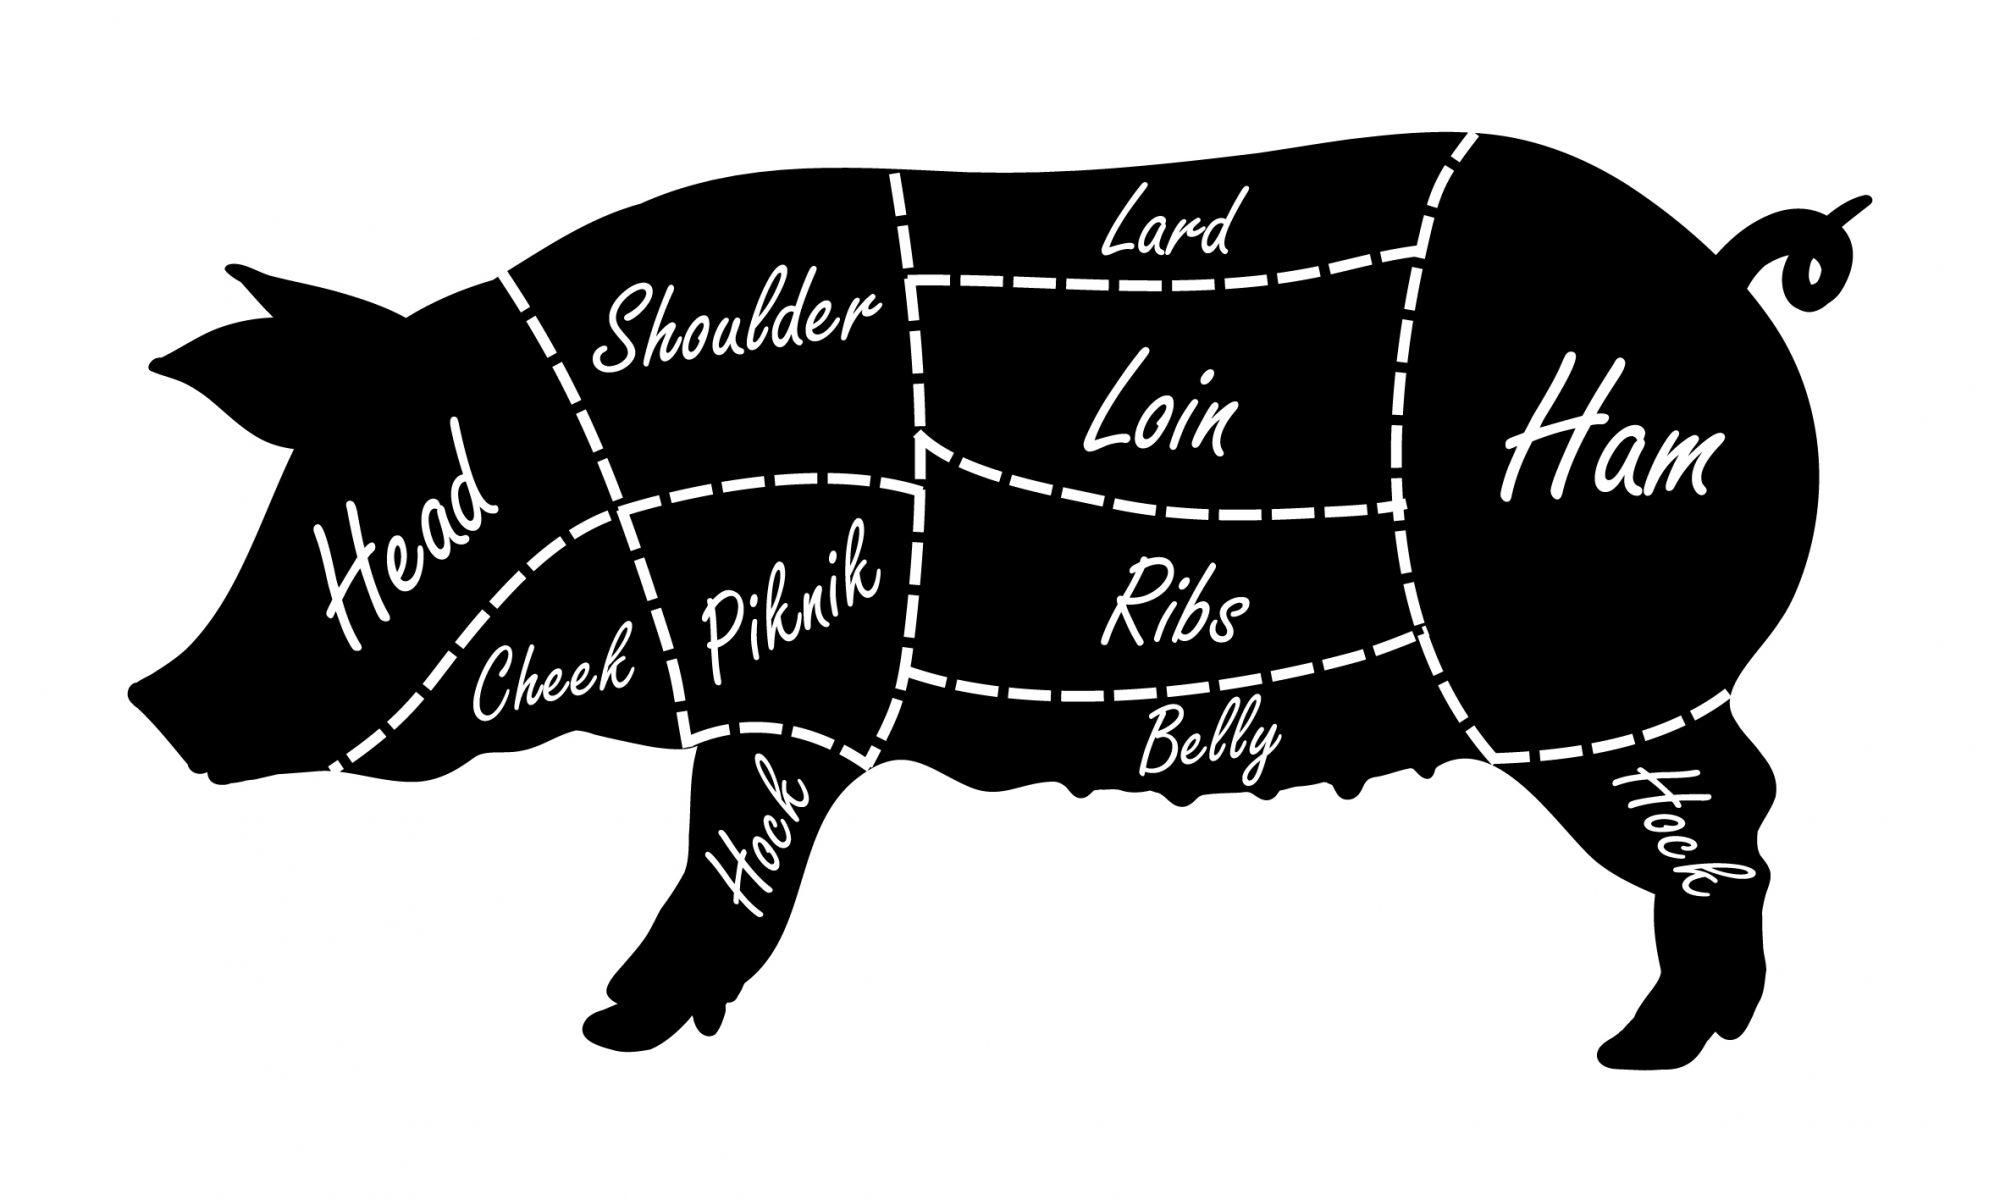 Pork Diagram Getty 12/18/19